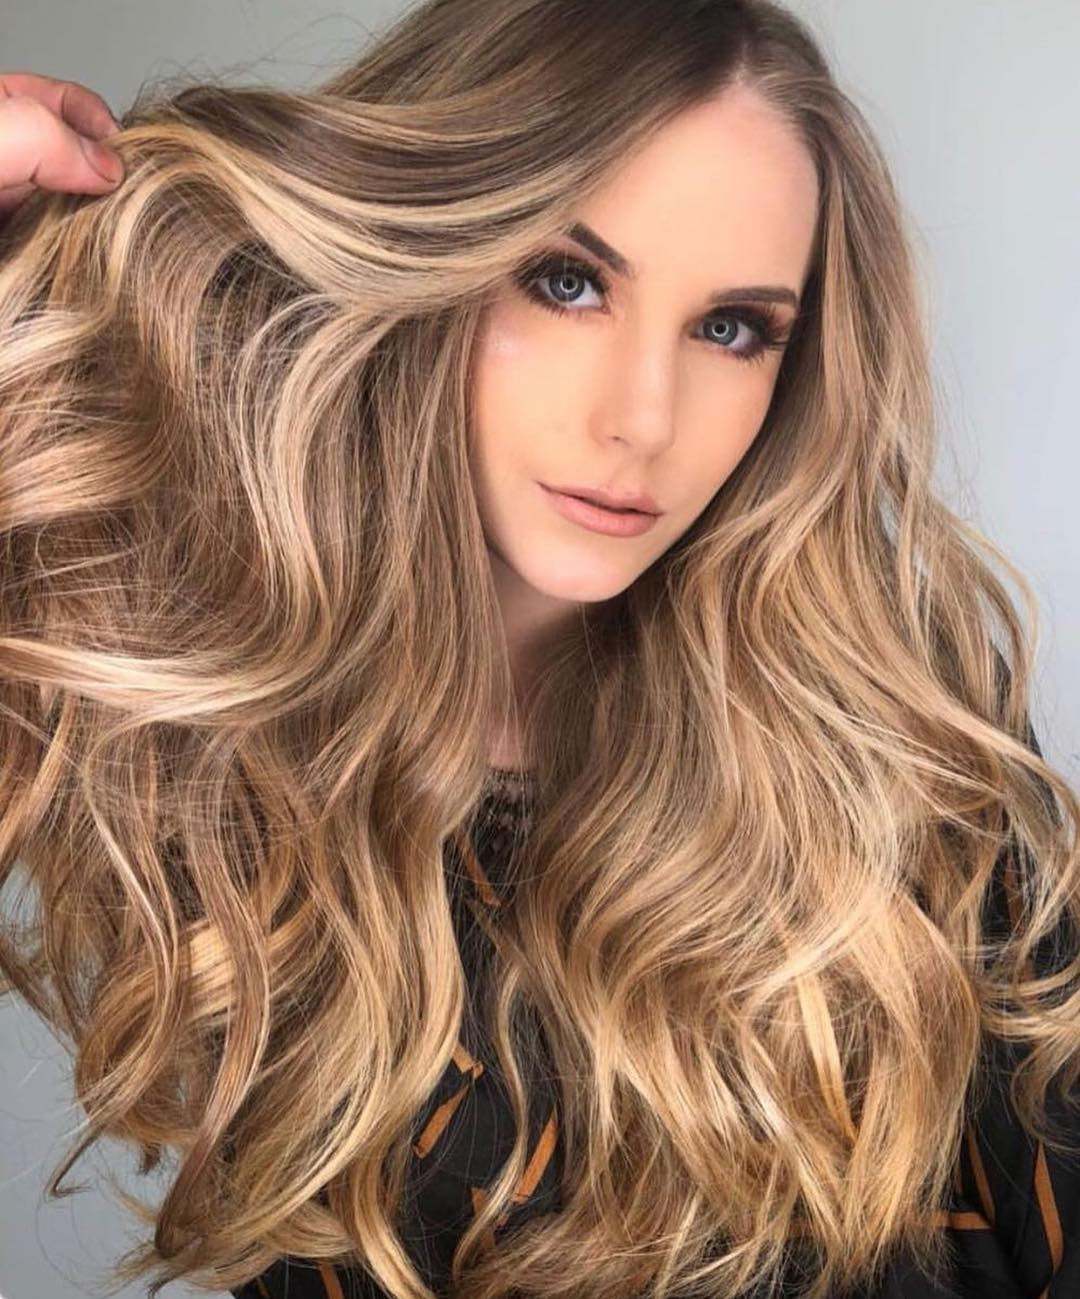 amanda pegoraro , miss brasil de las americas 2019. 29737510